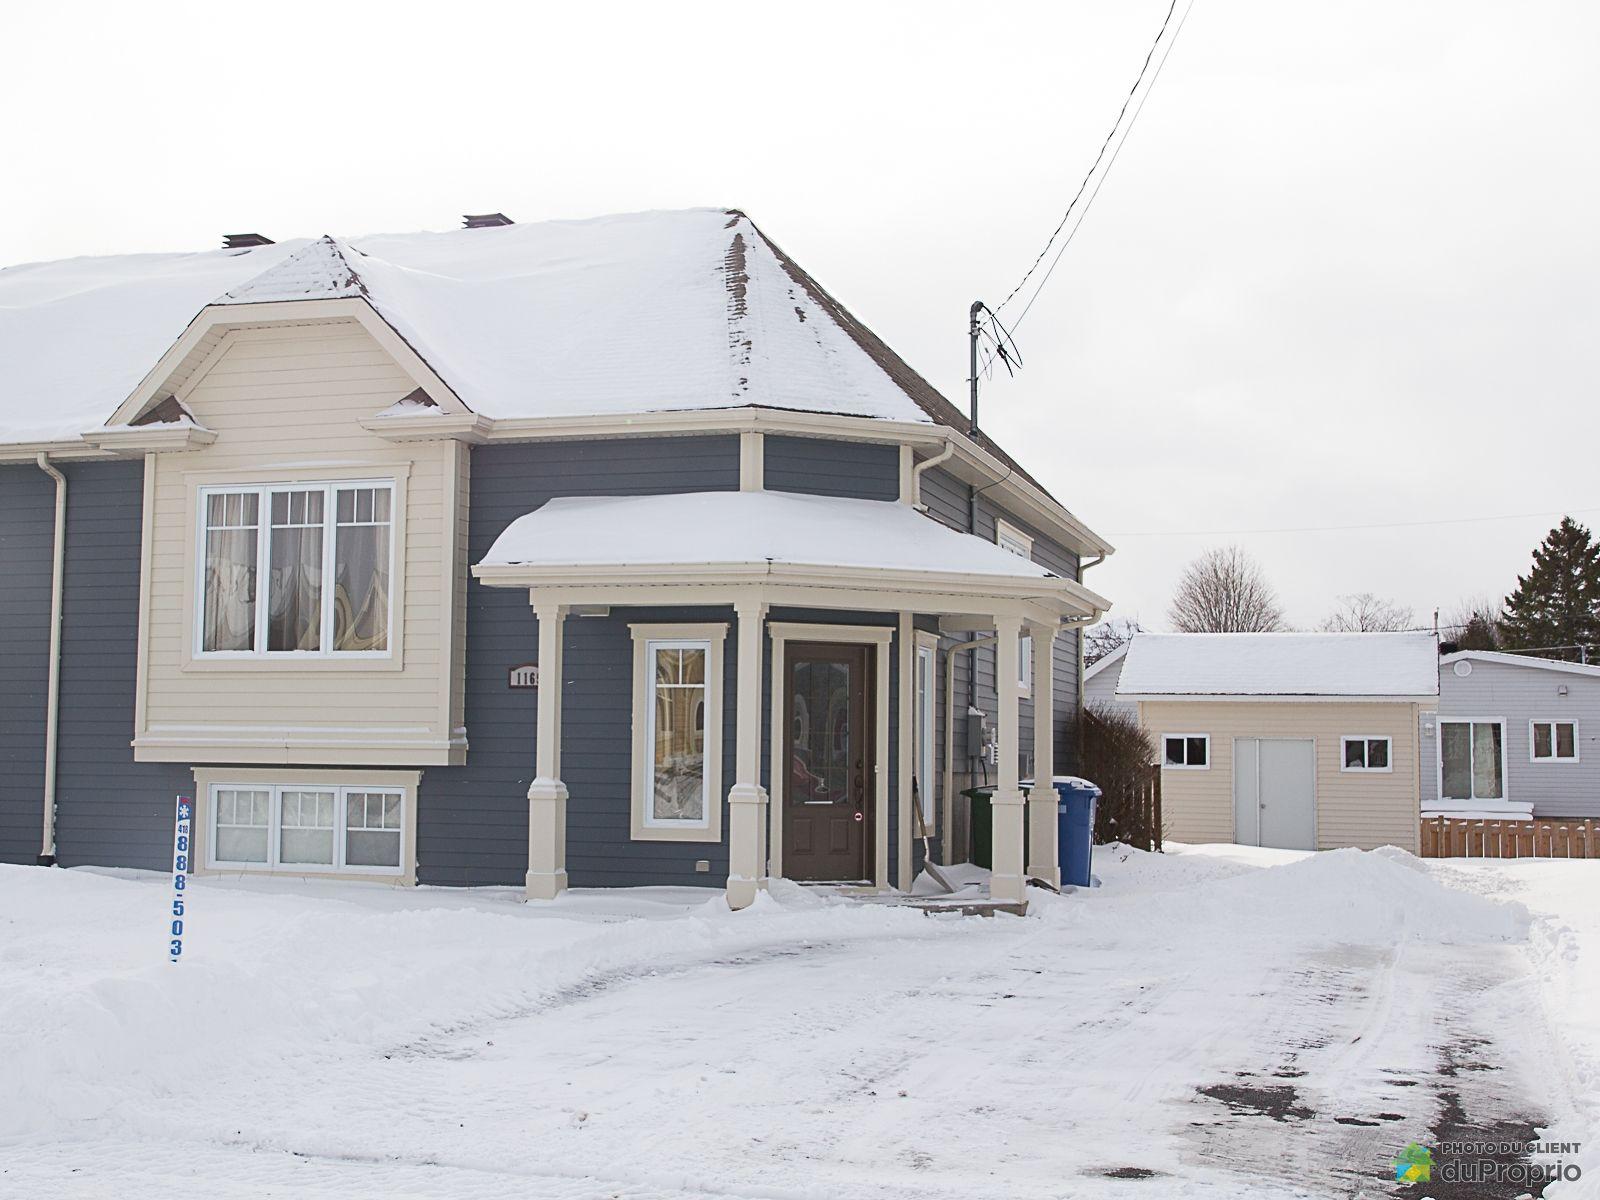 Winter Front - 1169 avenue Moffet, St-Agapit for sale